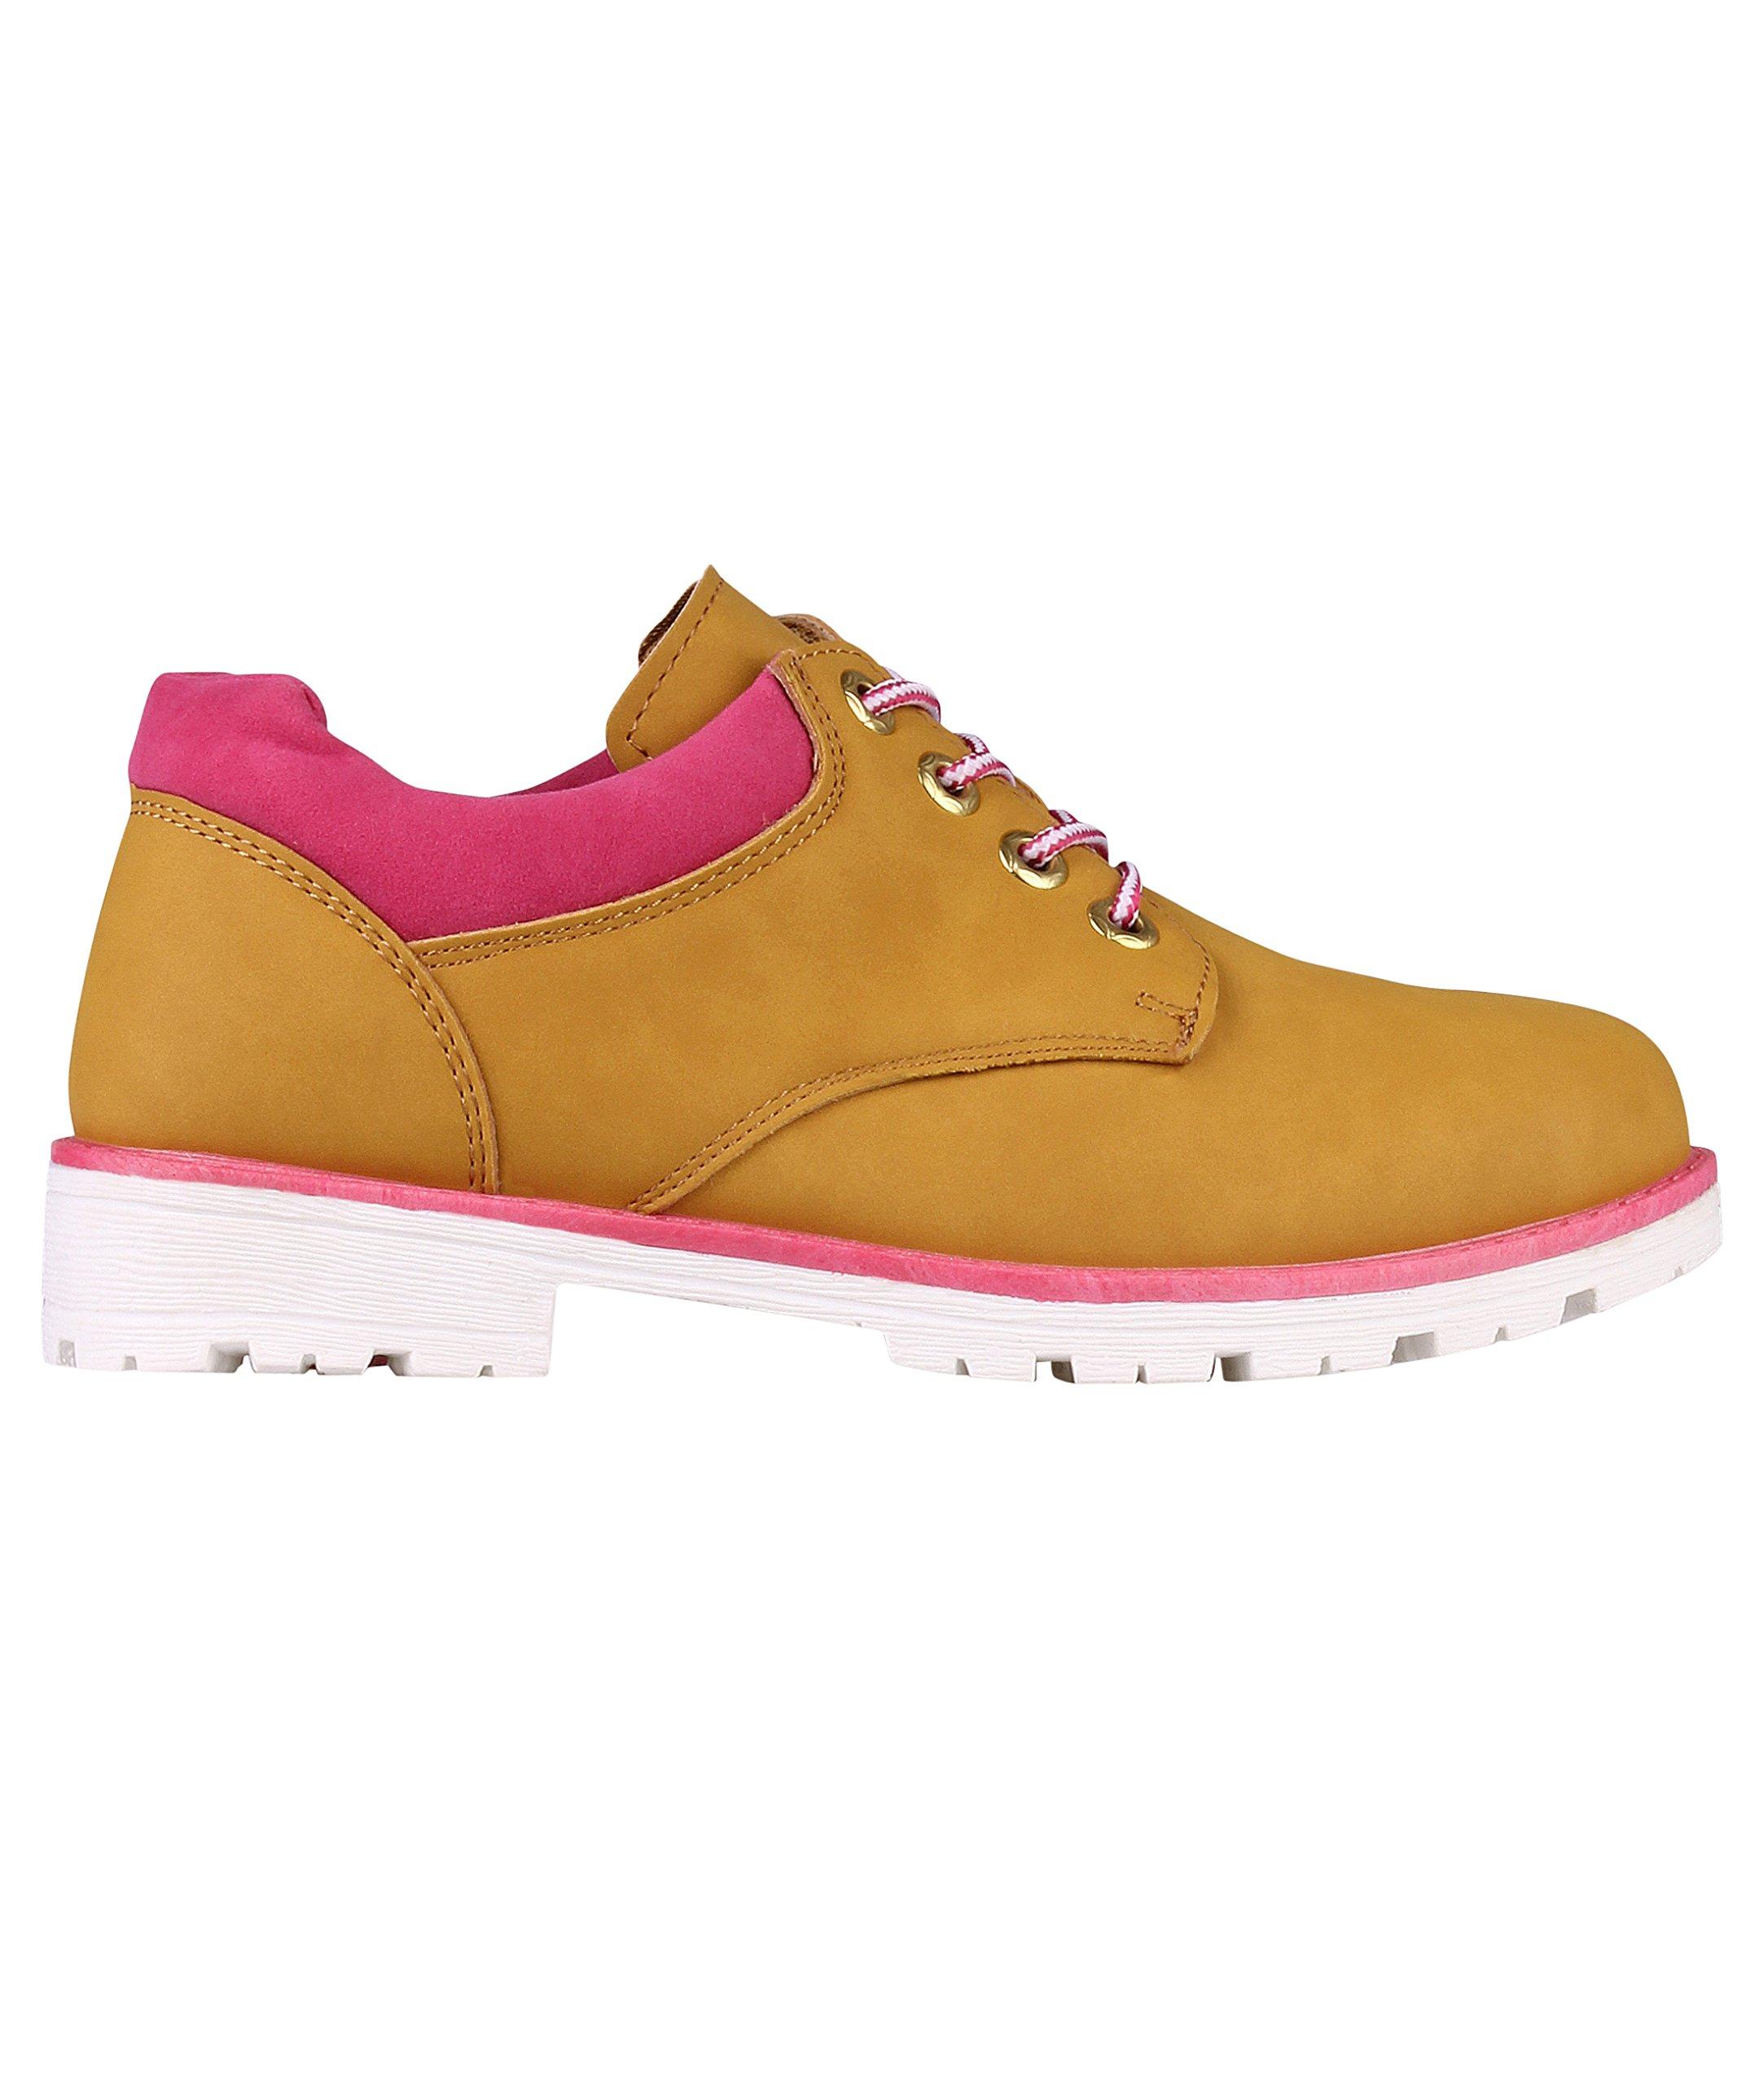 KRISP Low Top Worker Shoes (Camel, US 7),[5597-CAM-5]